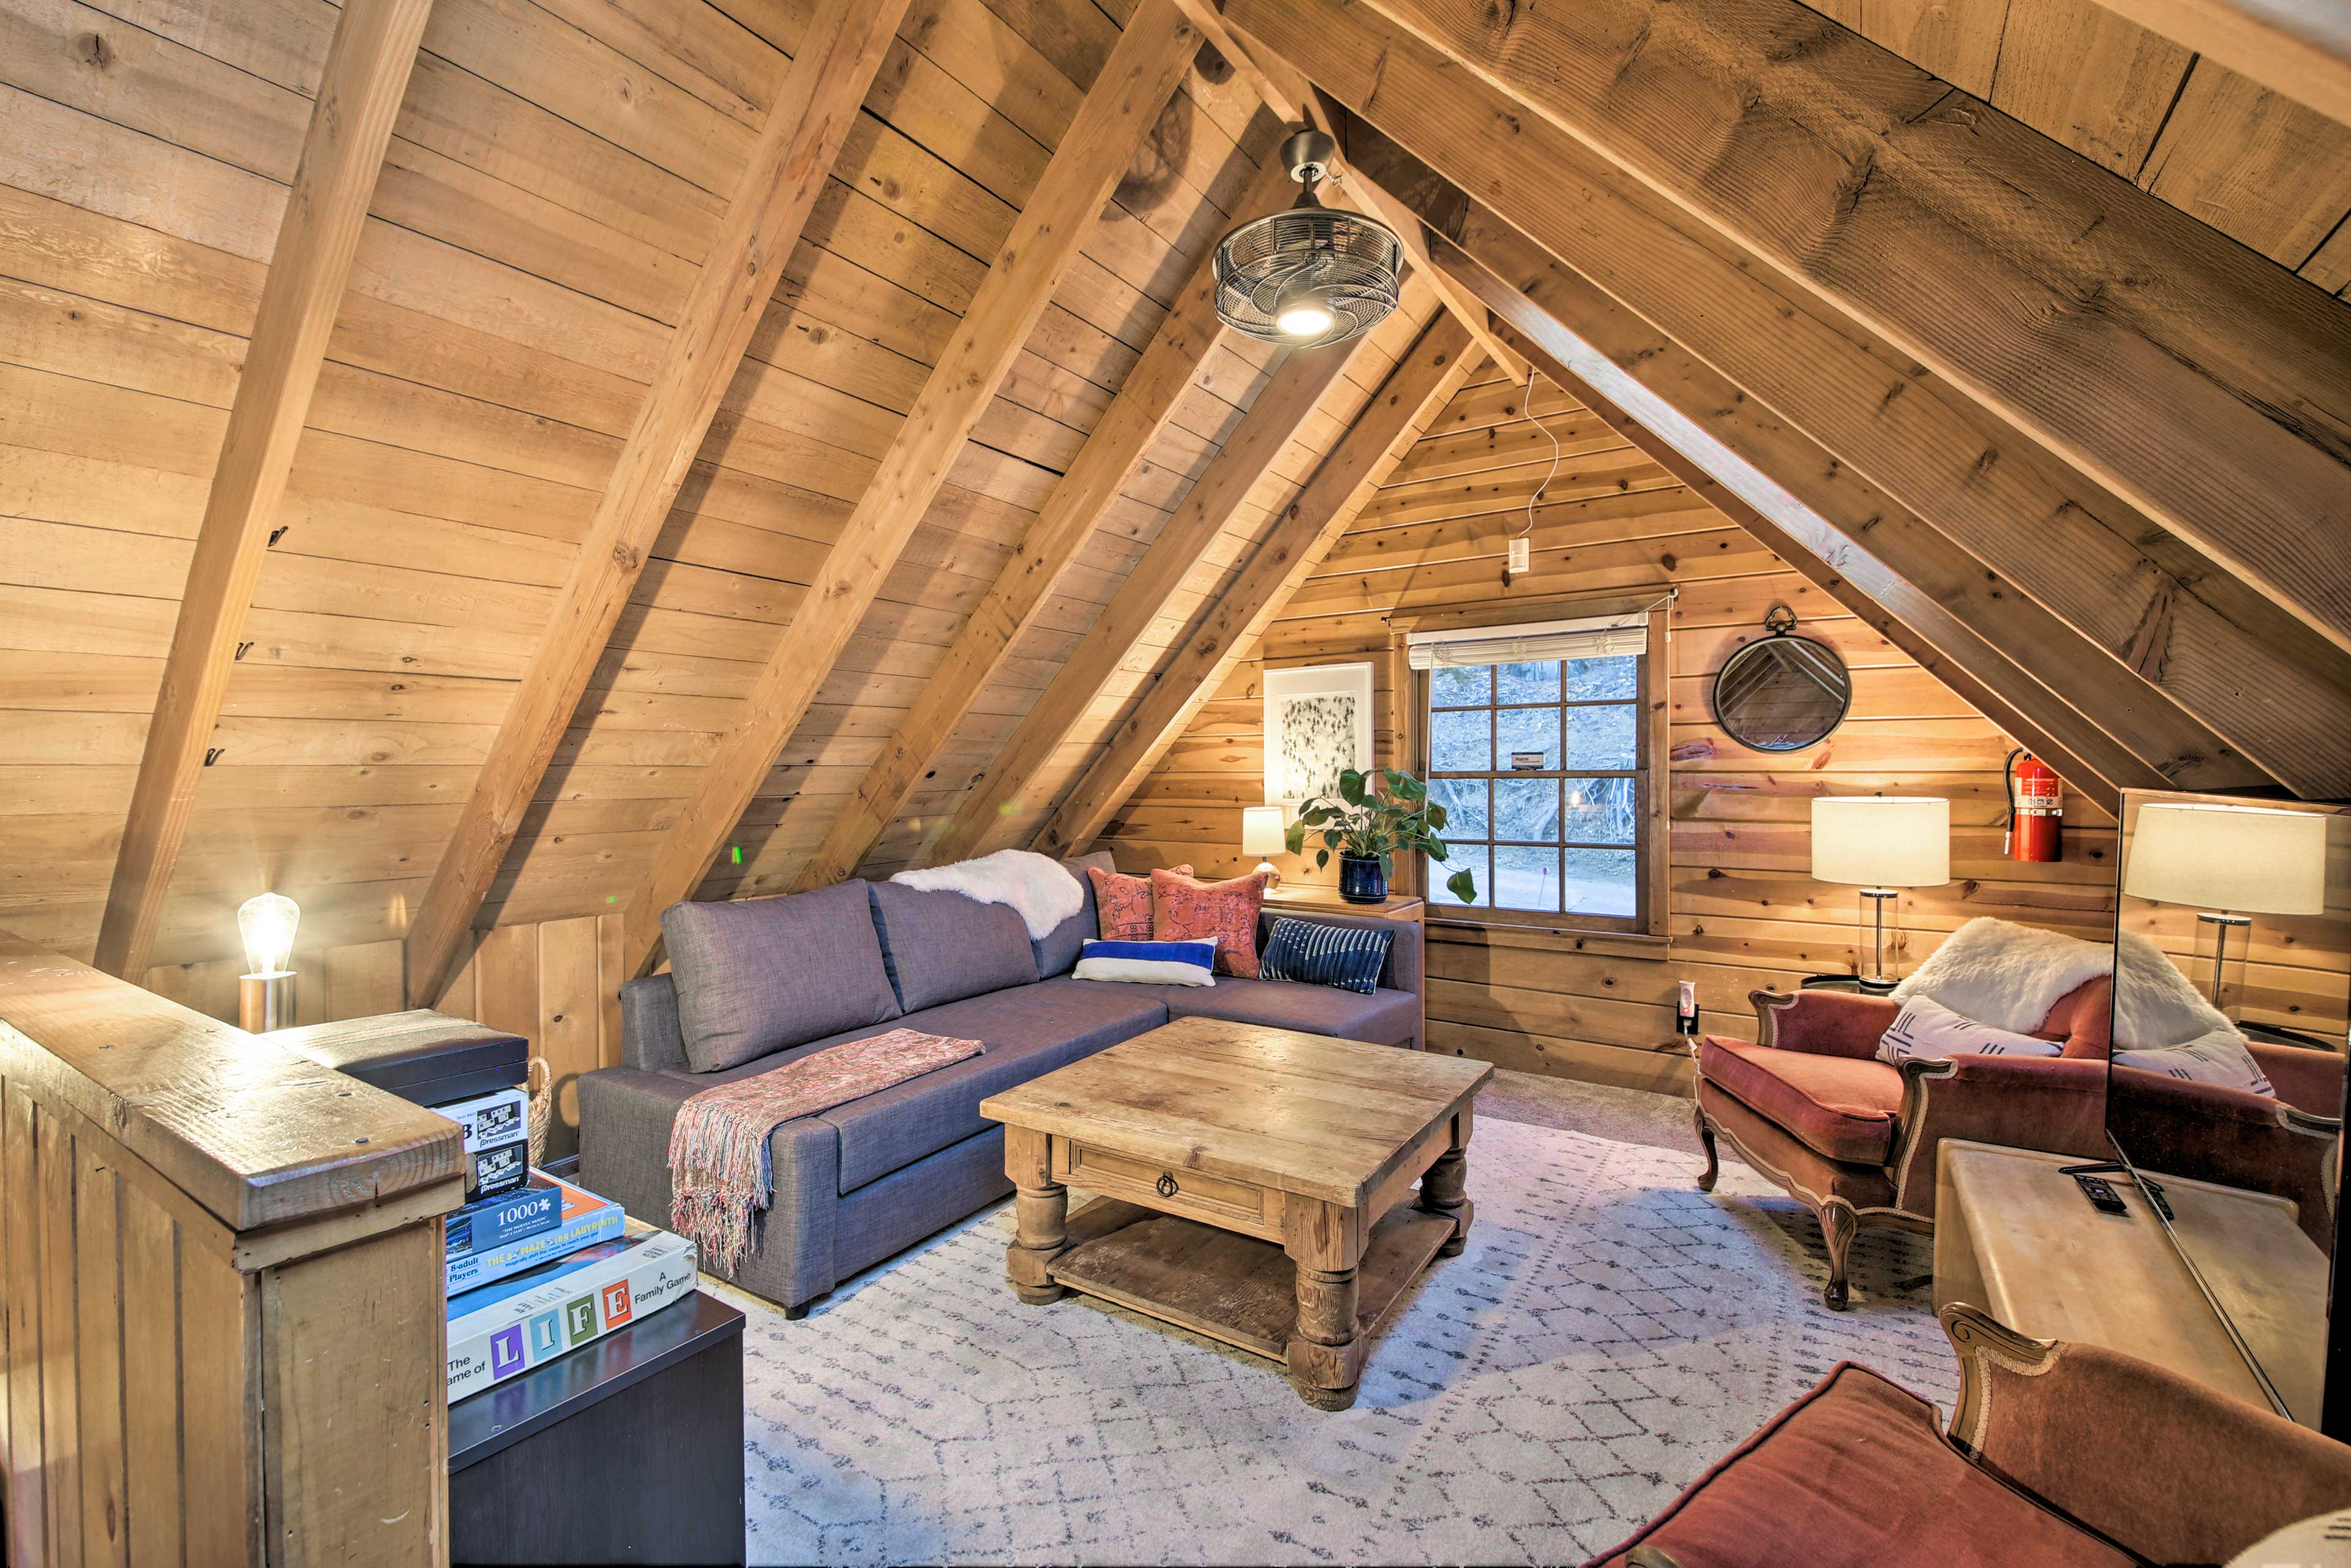 Two guests can enjoy nights of blissful sleep on the sleeper sofa.